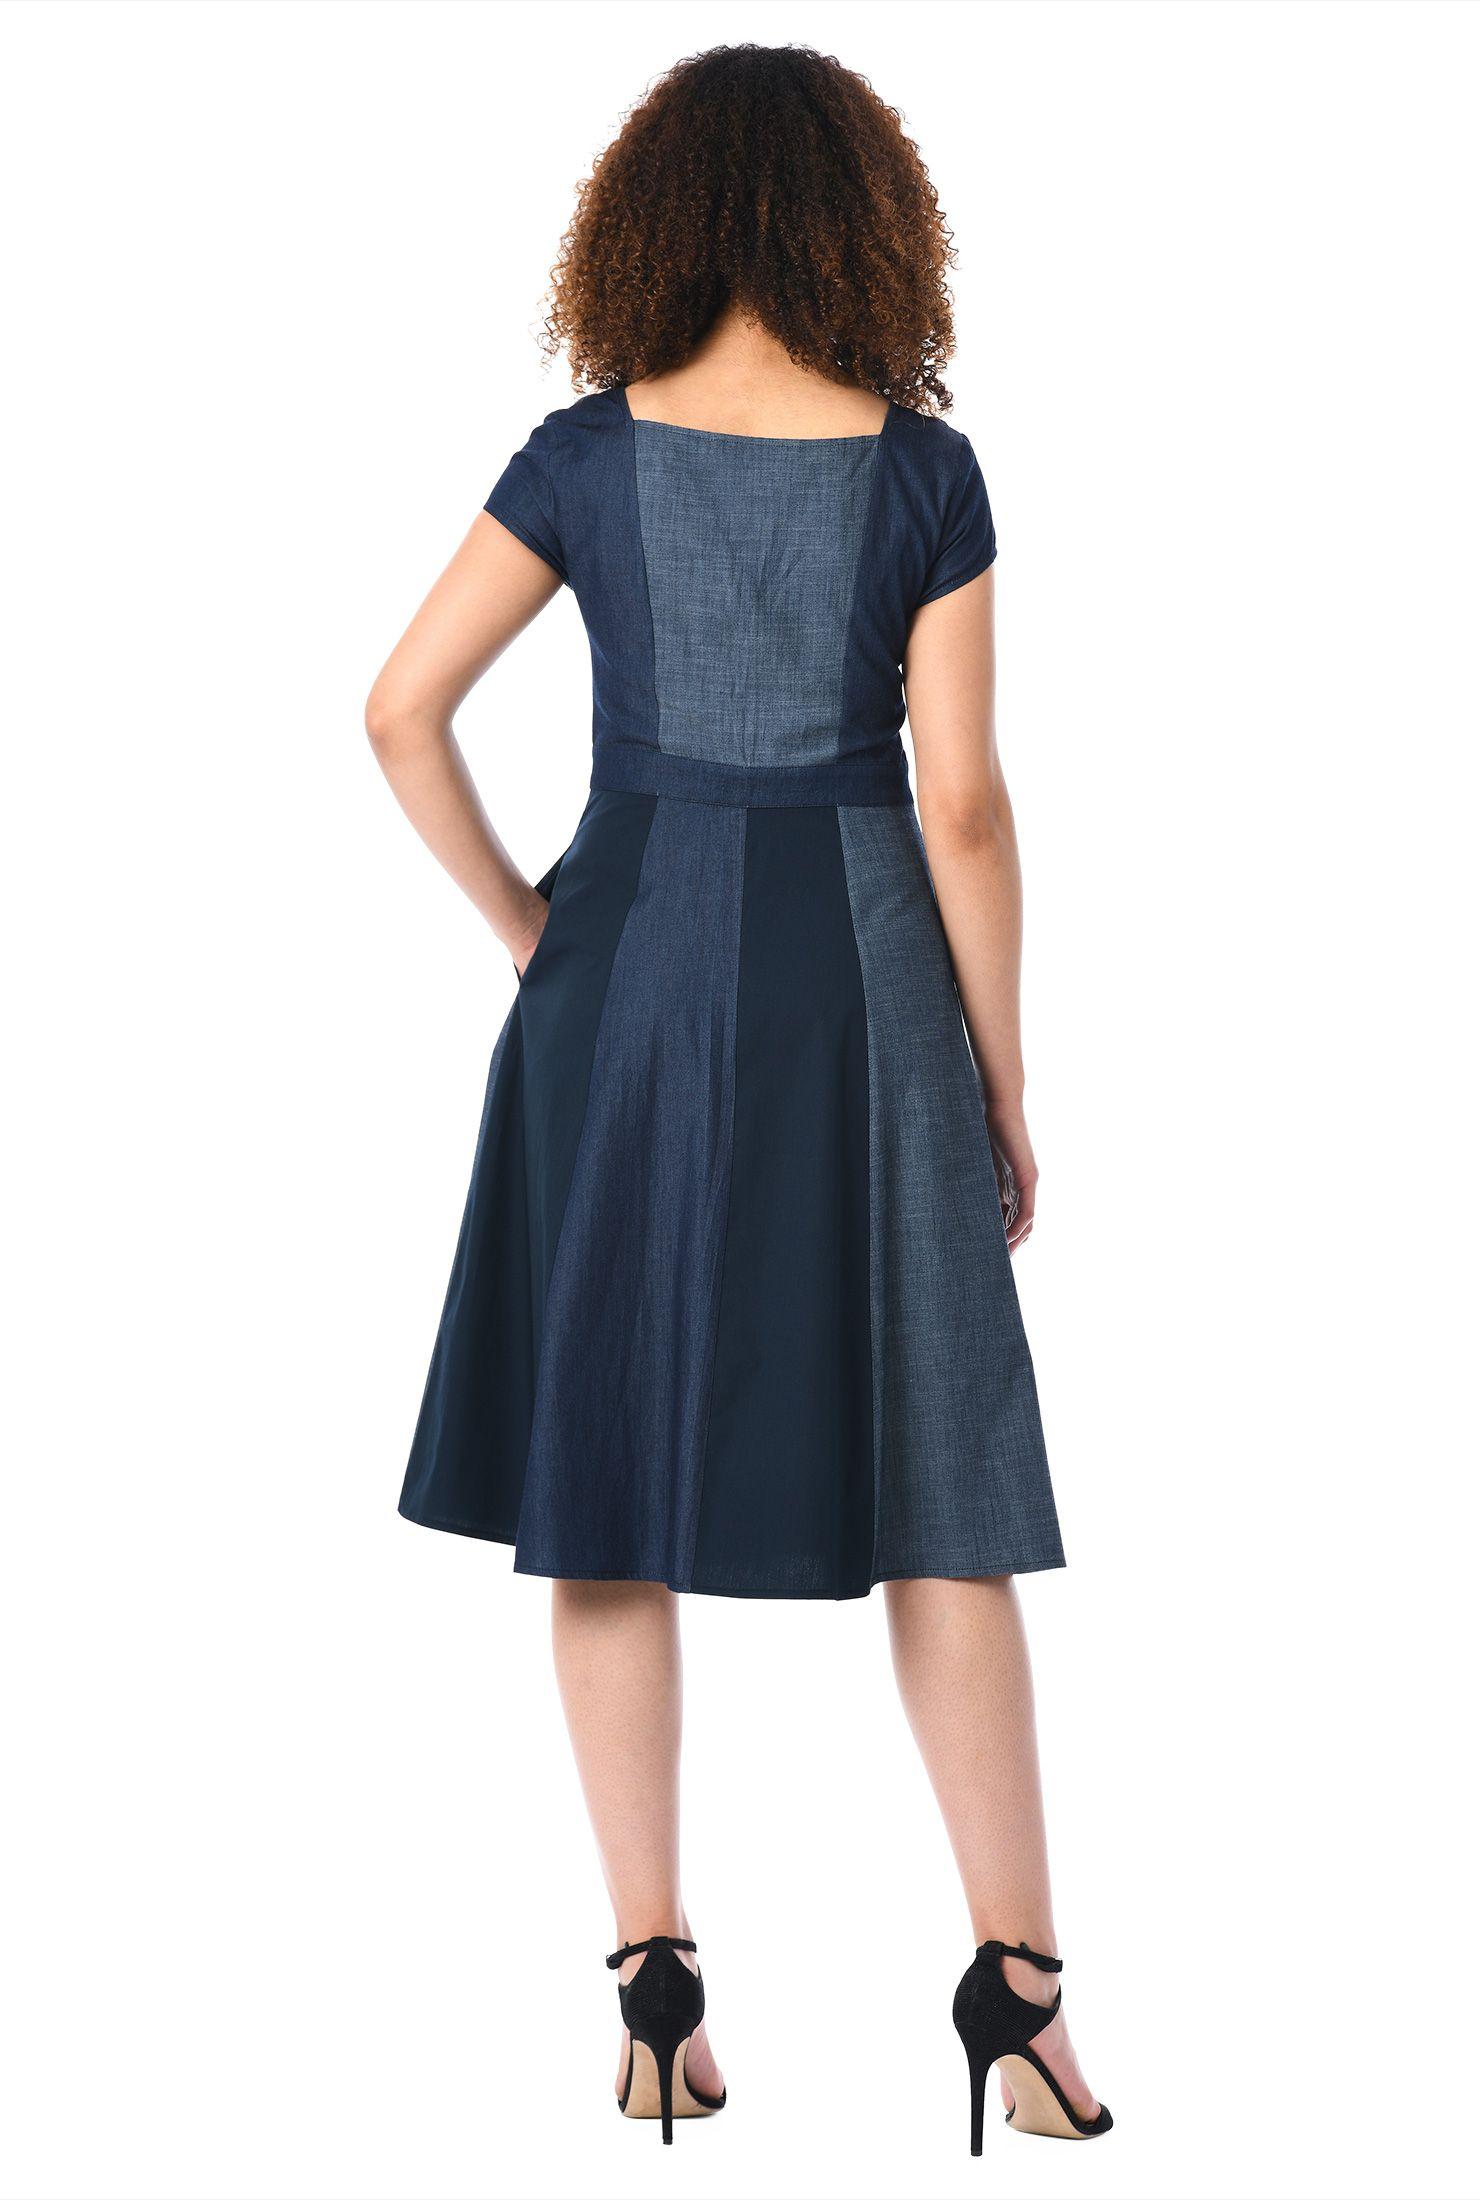 Below knee length dresses button front dresses cap sleeve dresses